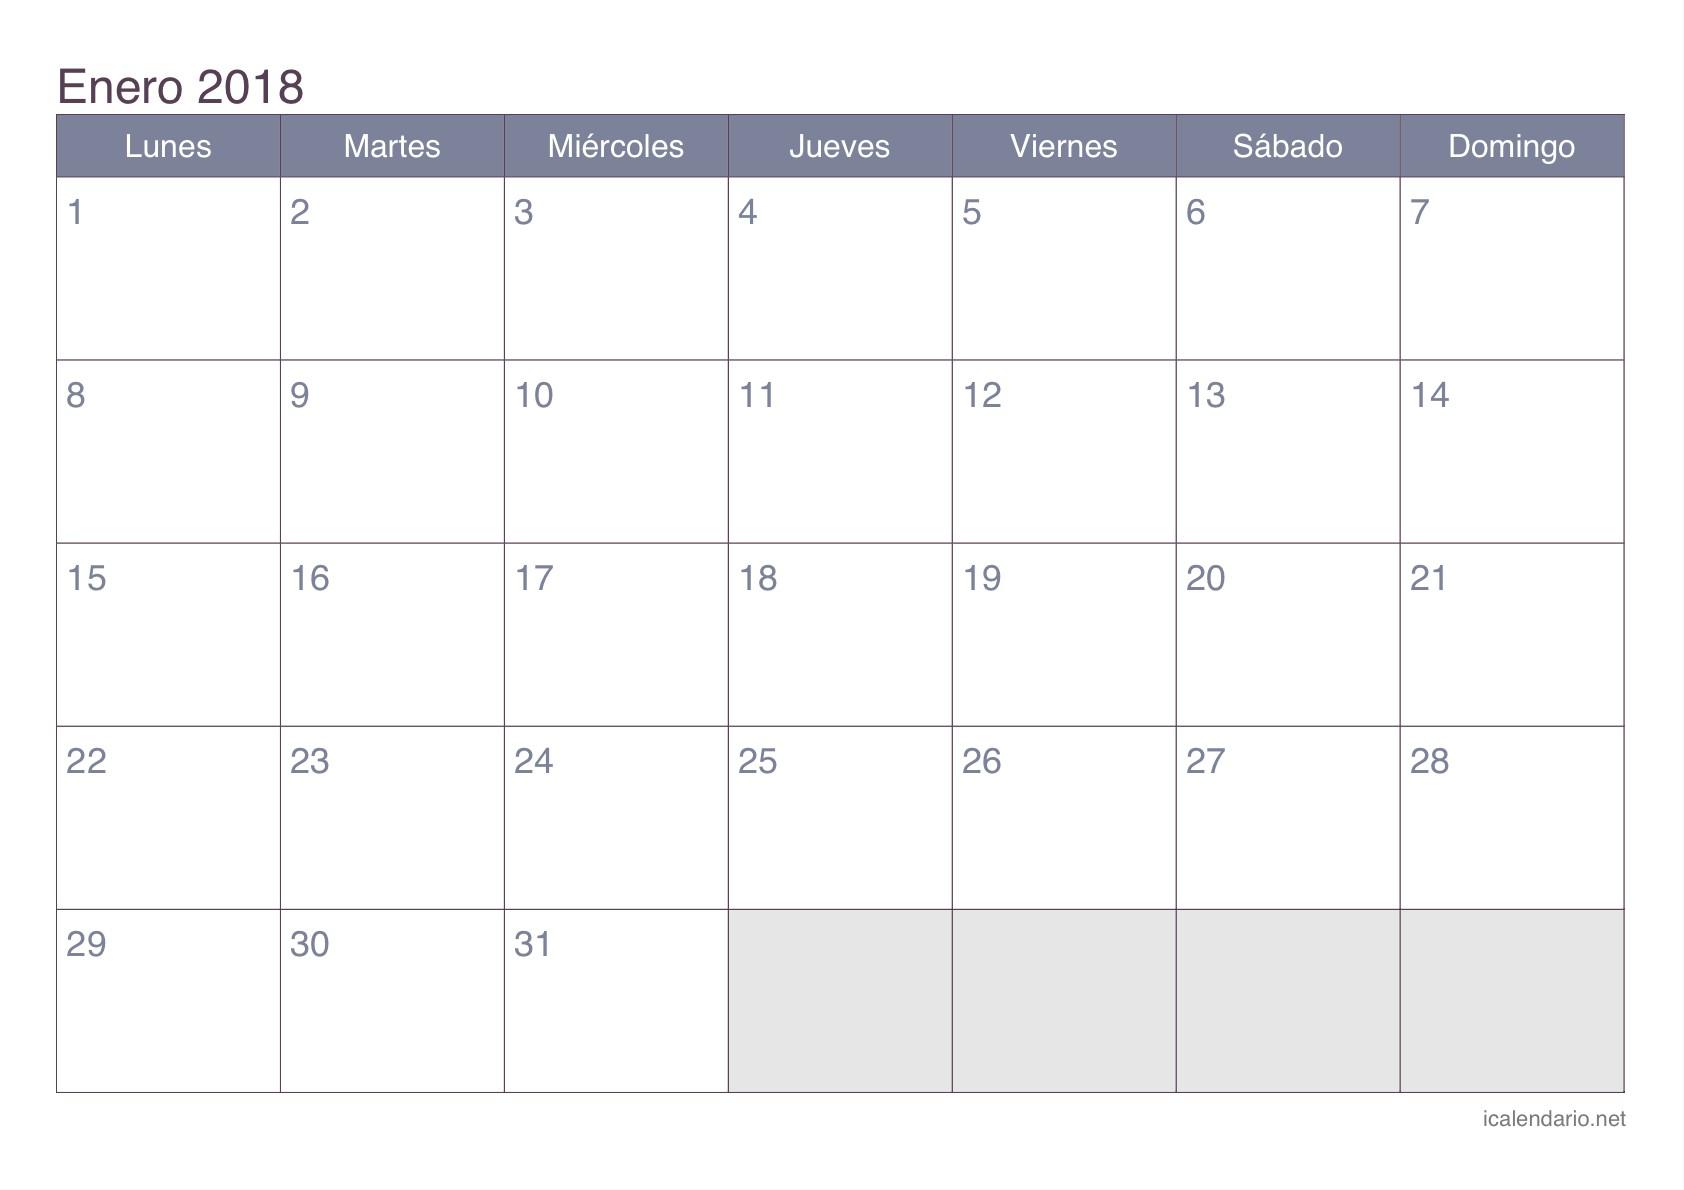 Calendario 2019 Para Imprimir Chile Gratis Más Recientes 2019 2018 Calendar Printable with Holidays List Kalender Kalendar Of Calendario 2019 Para Imprimir Chile Gratis Actual Best Calendario Septiembre 2015 Para Imprimir Image Collection